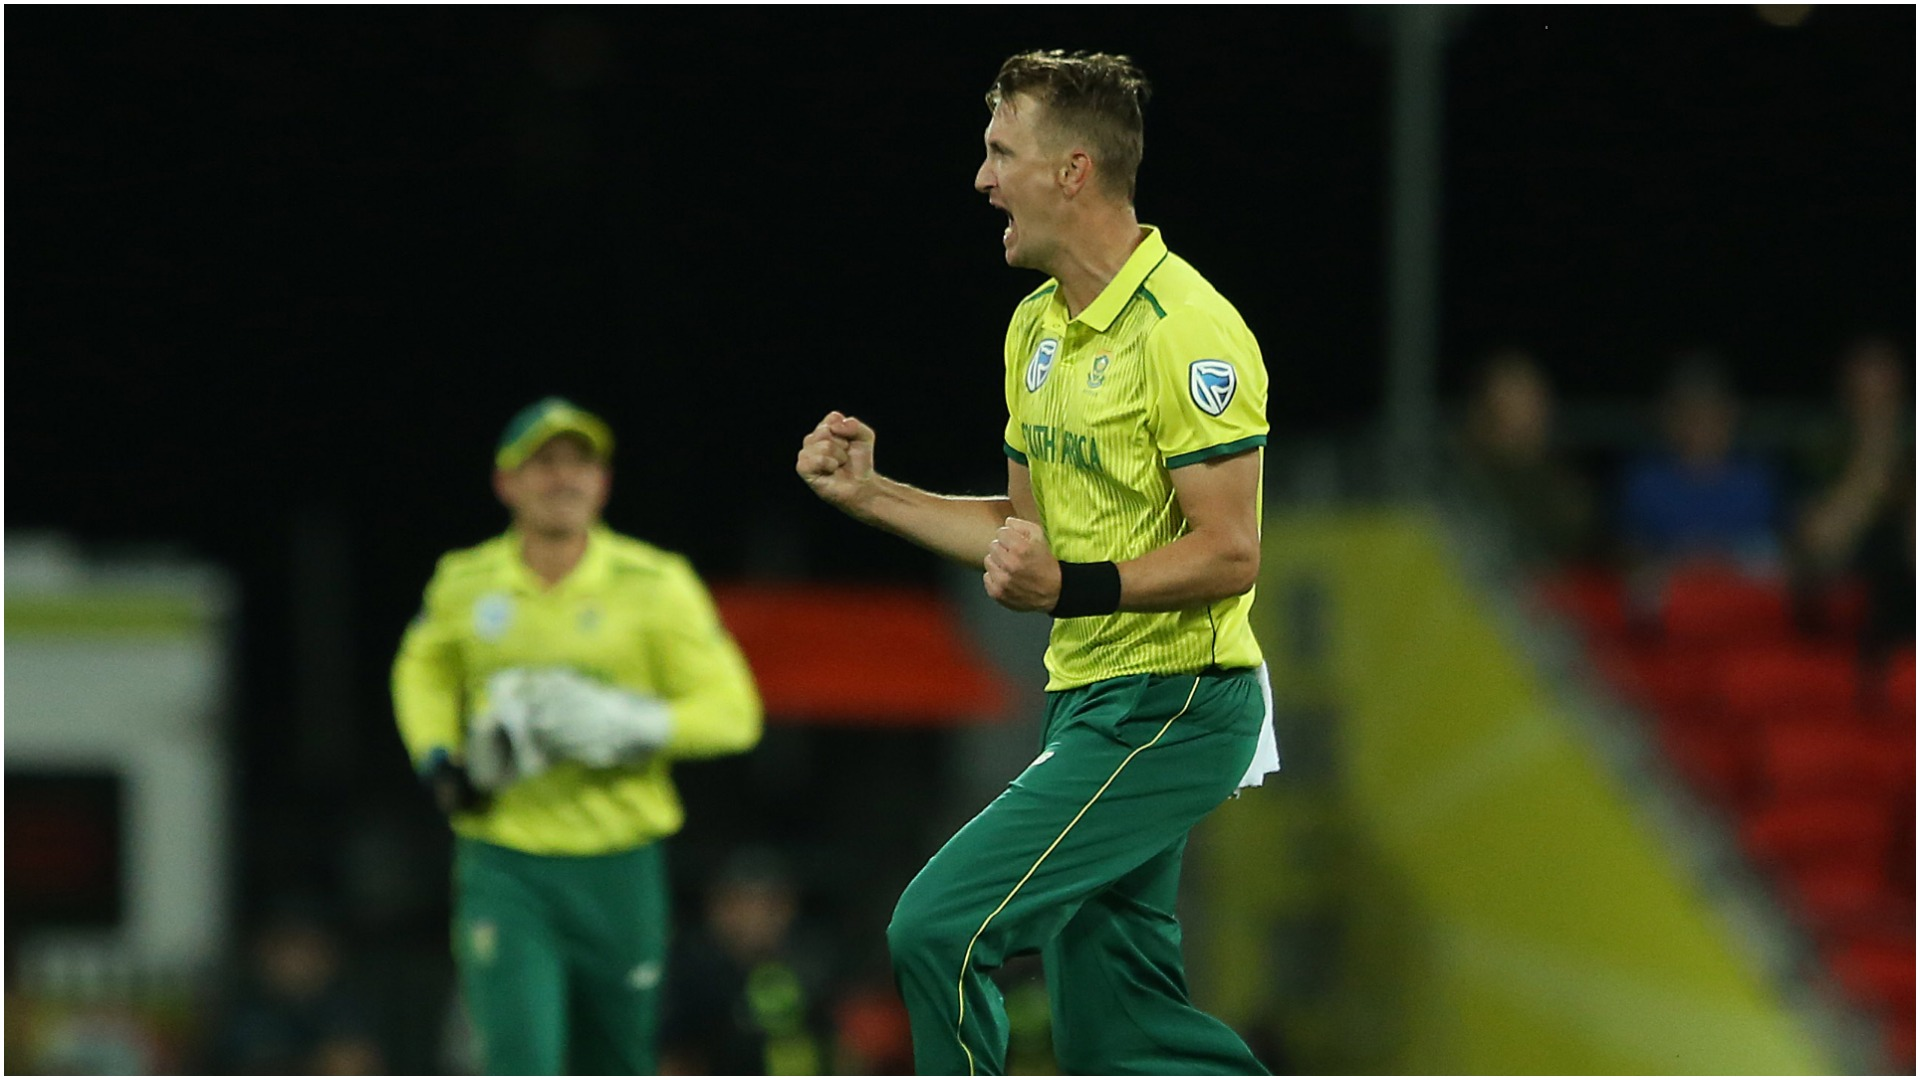 Morris and Steyn rattle Sri Lanka to clinch T20 series win